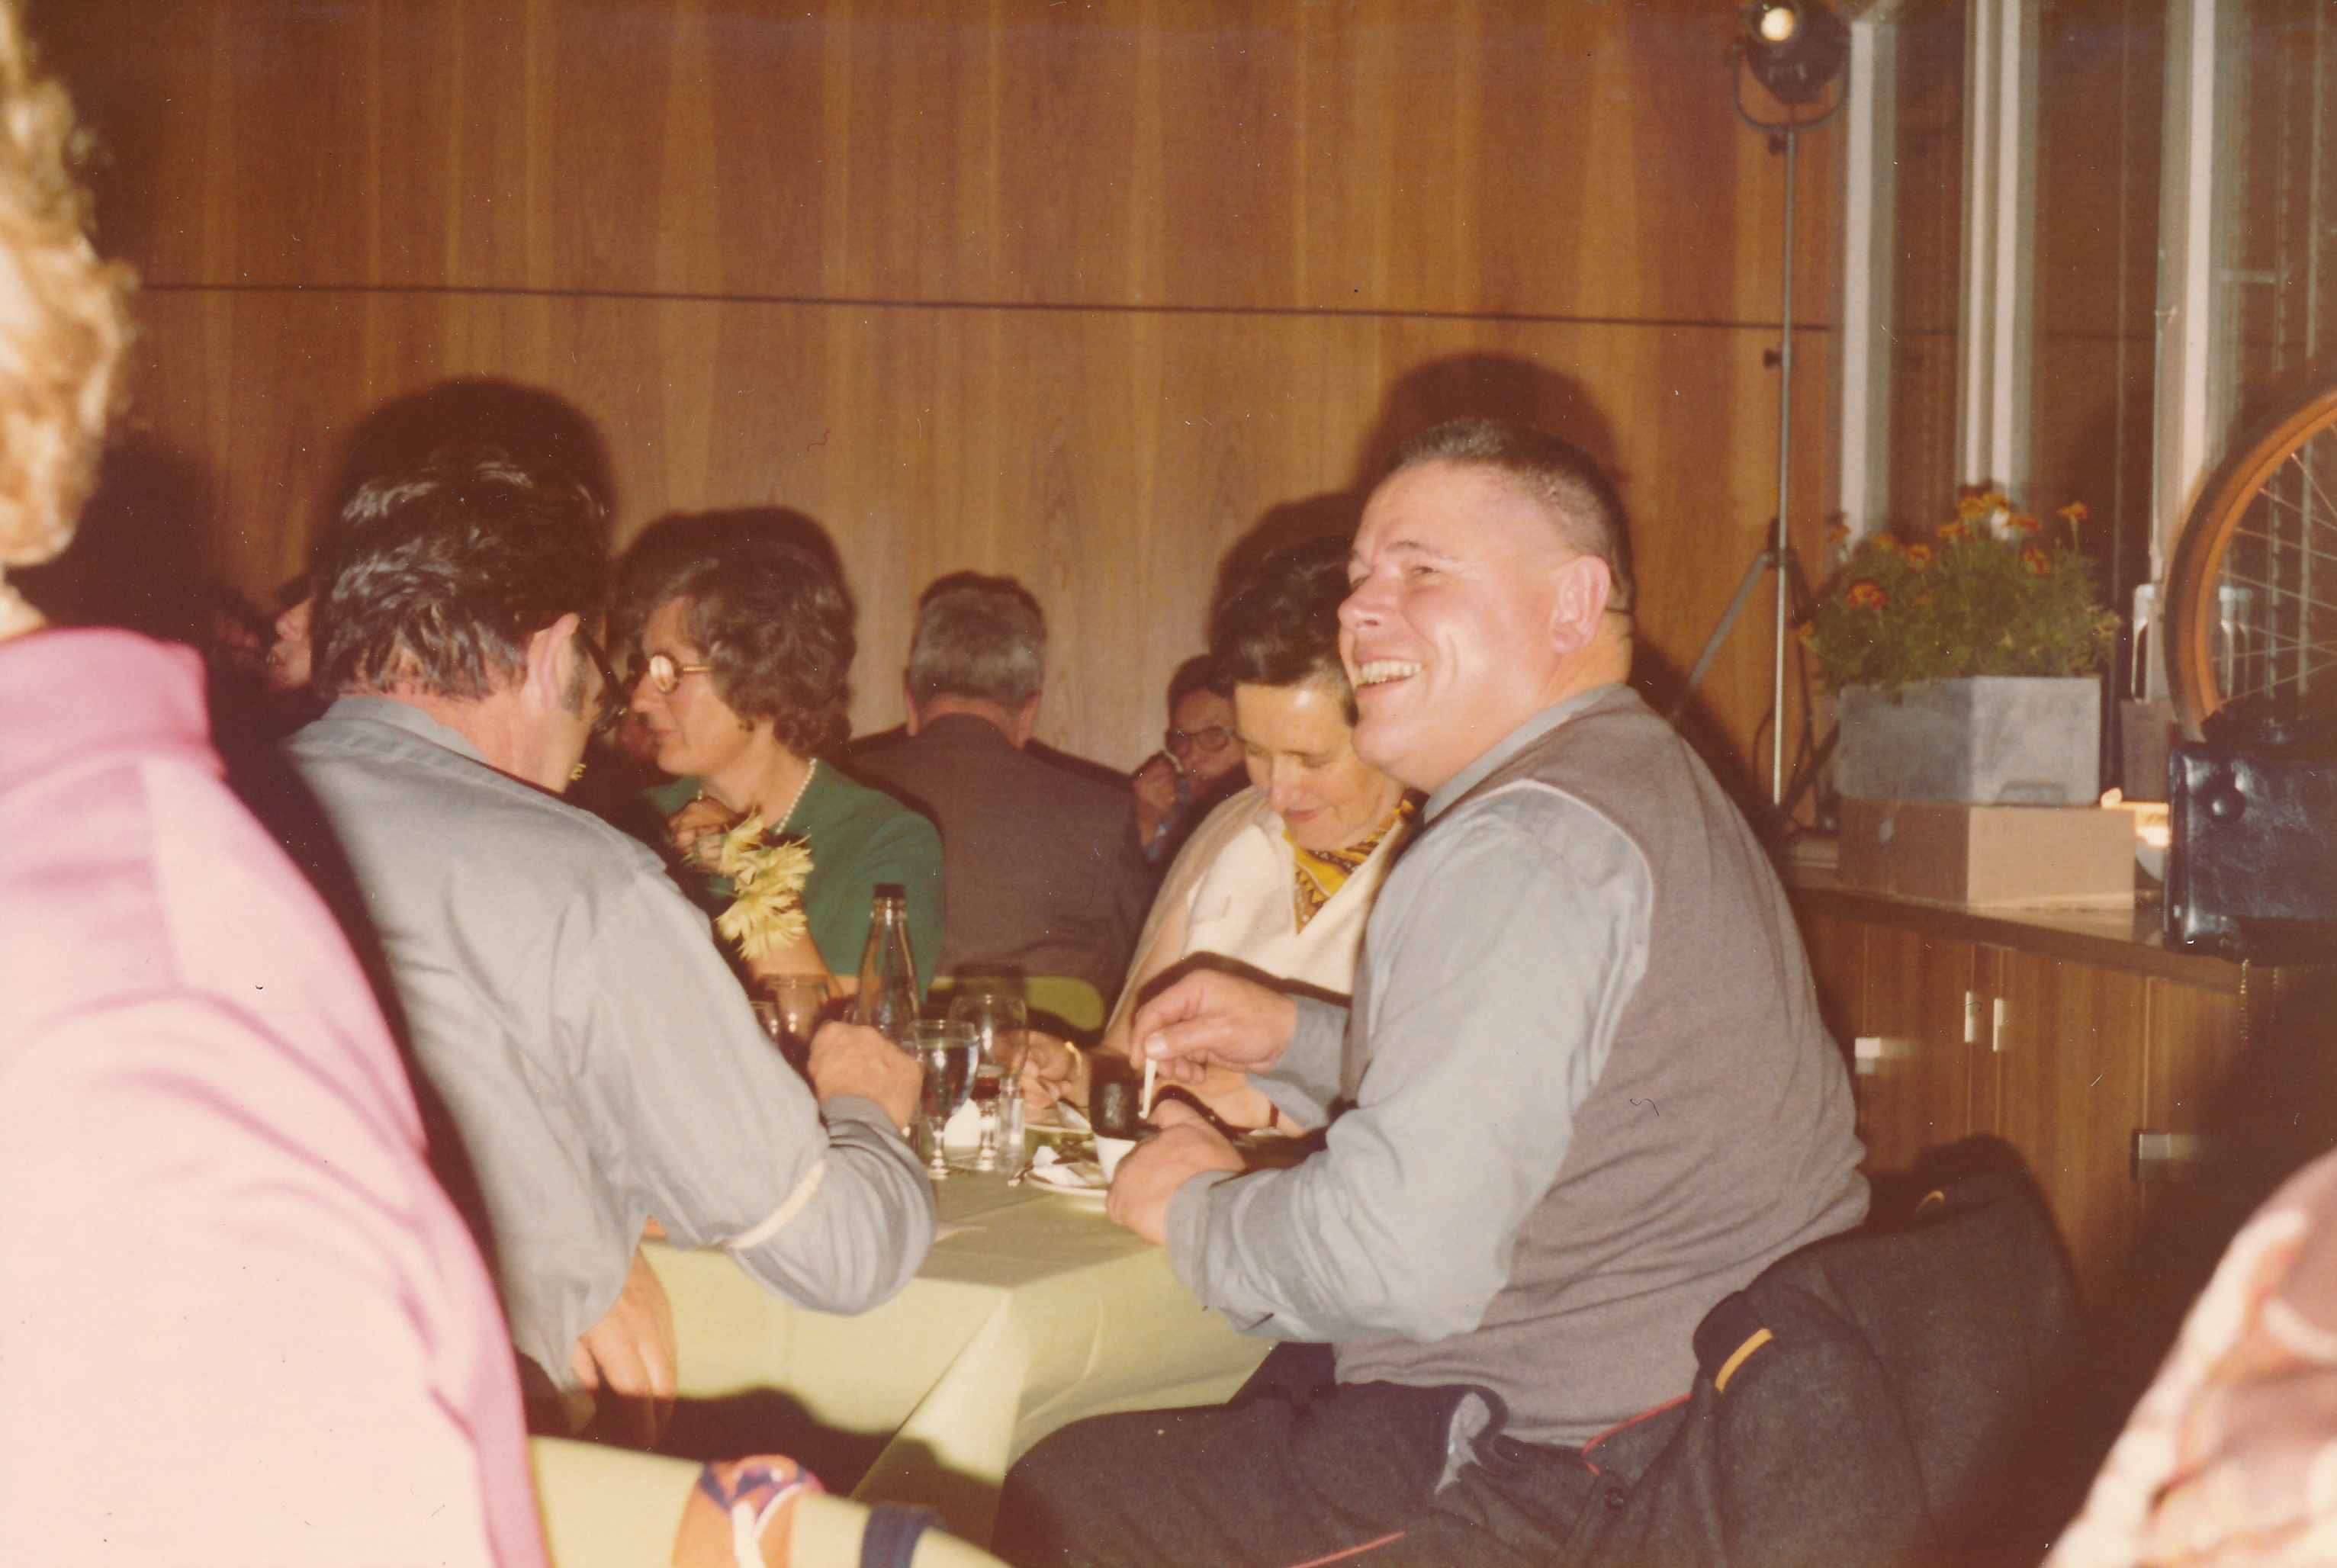 Feuerwehr Uster Hauptübung 25.10.1975